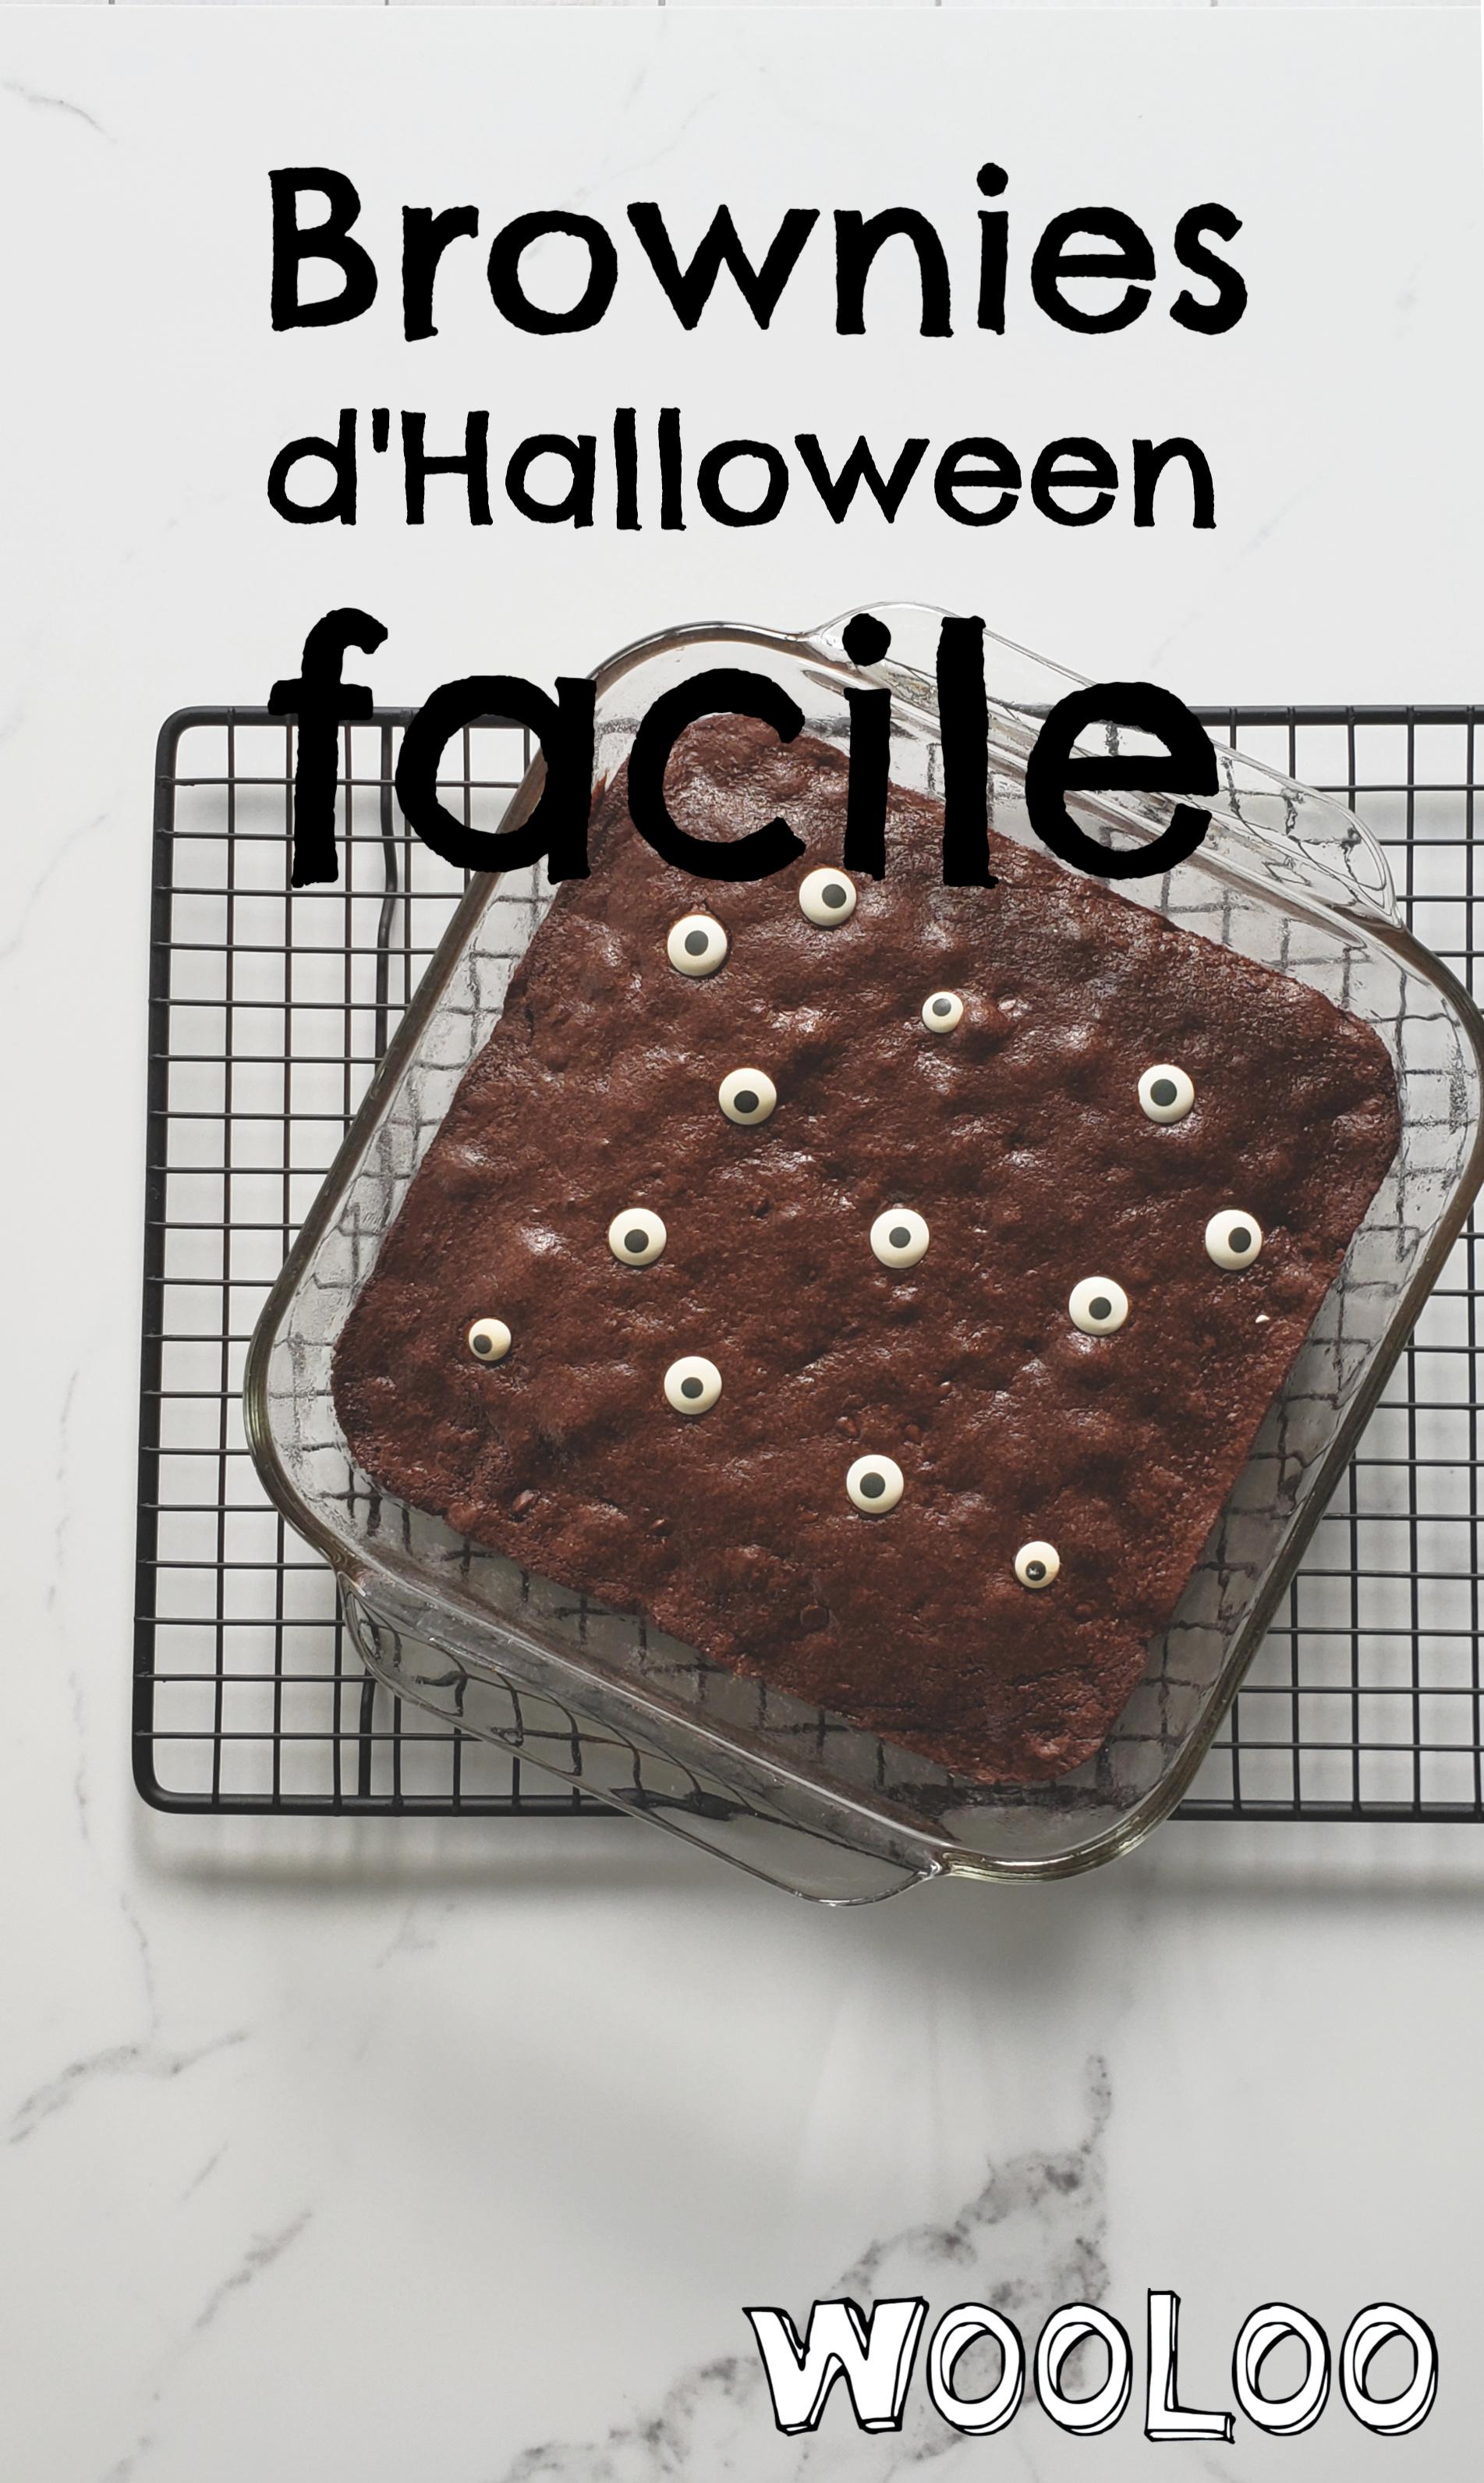 Brownies d'Halloween wooloo